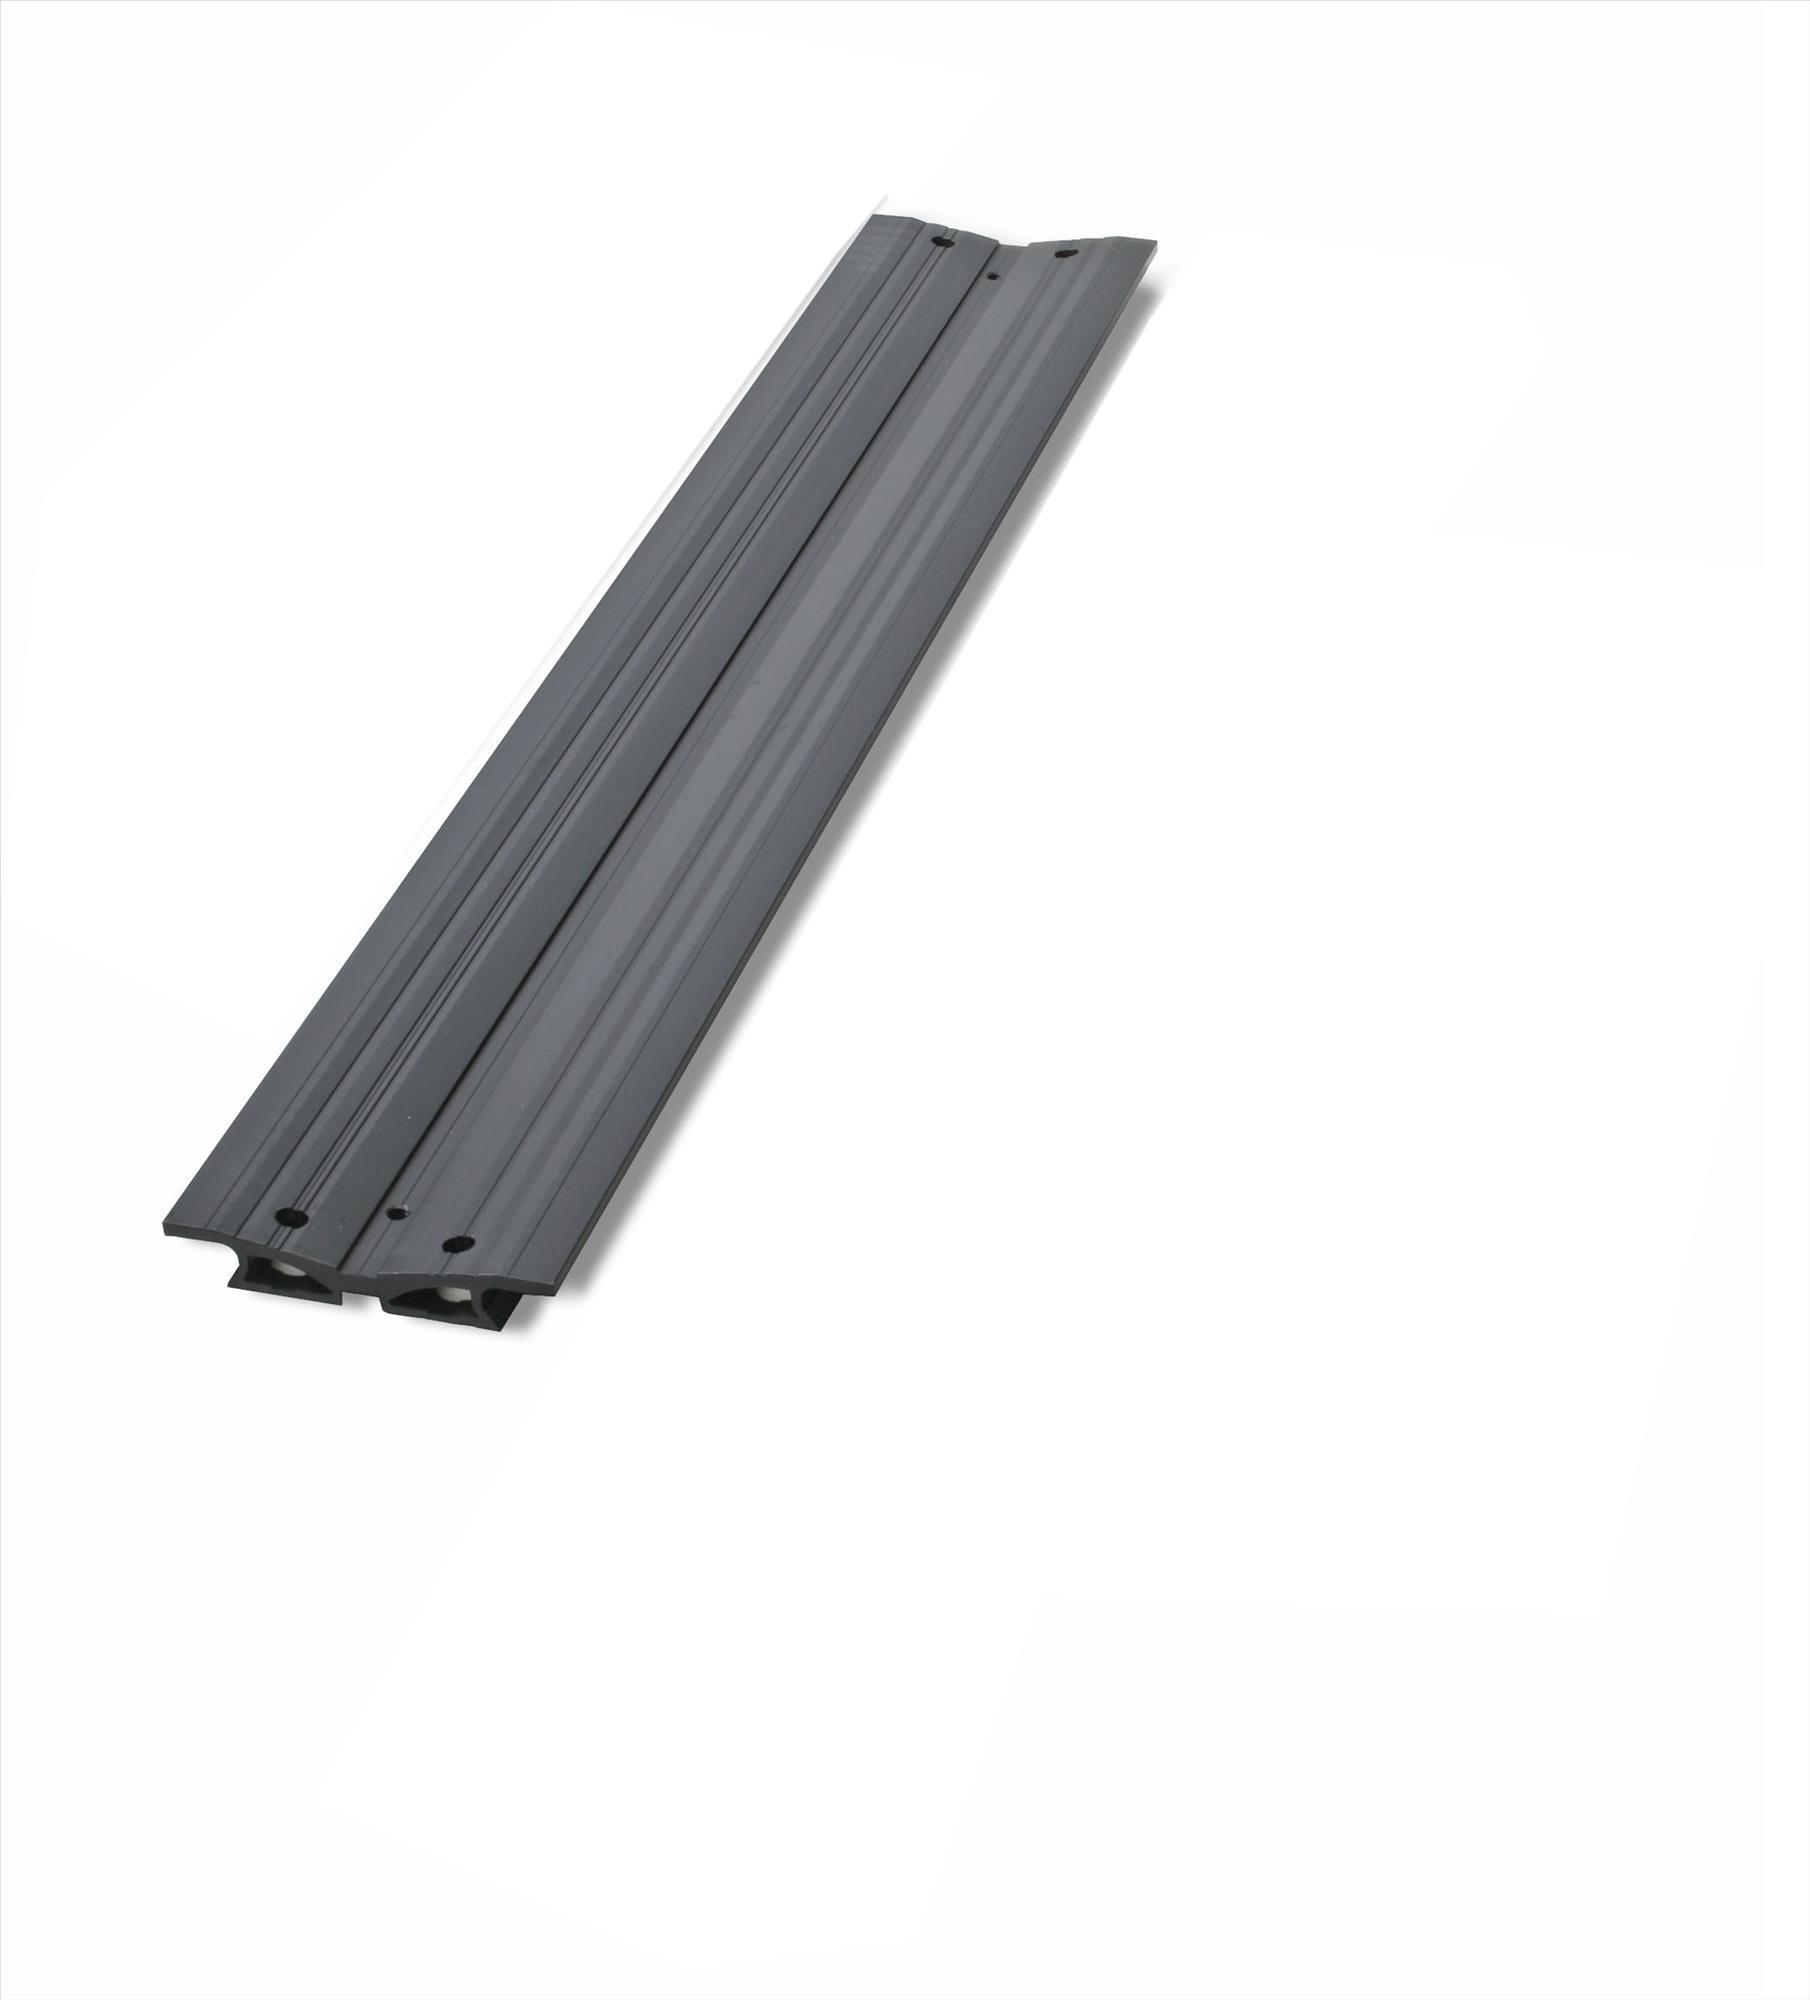 "Baader 3"" Dove Tail Bar, 610mm (24"")"